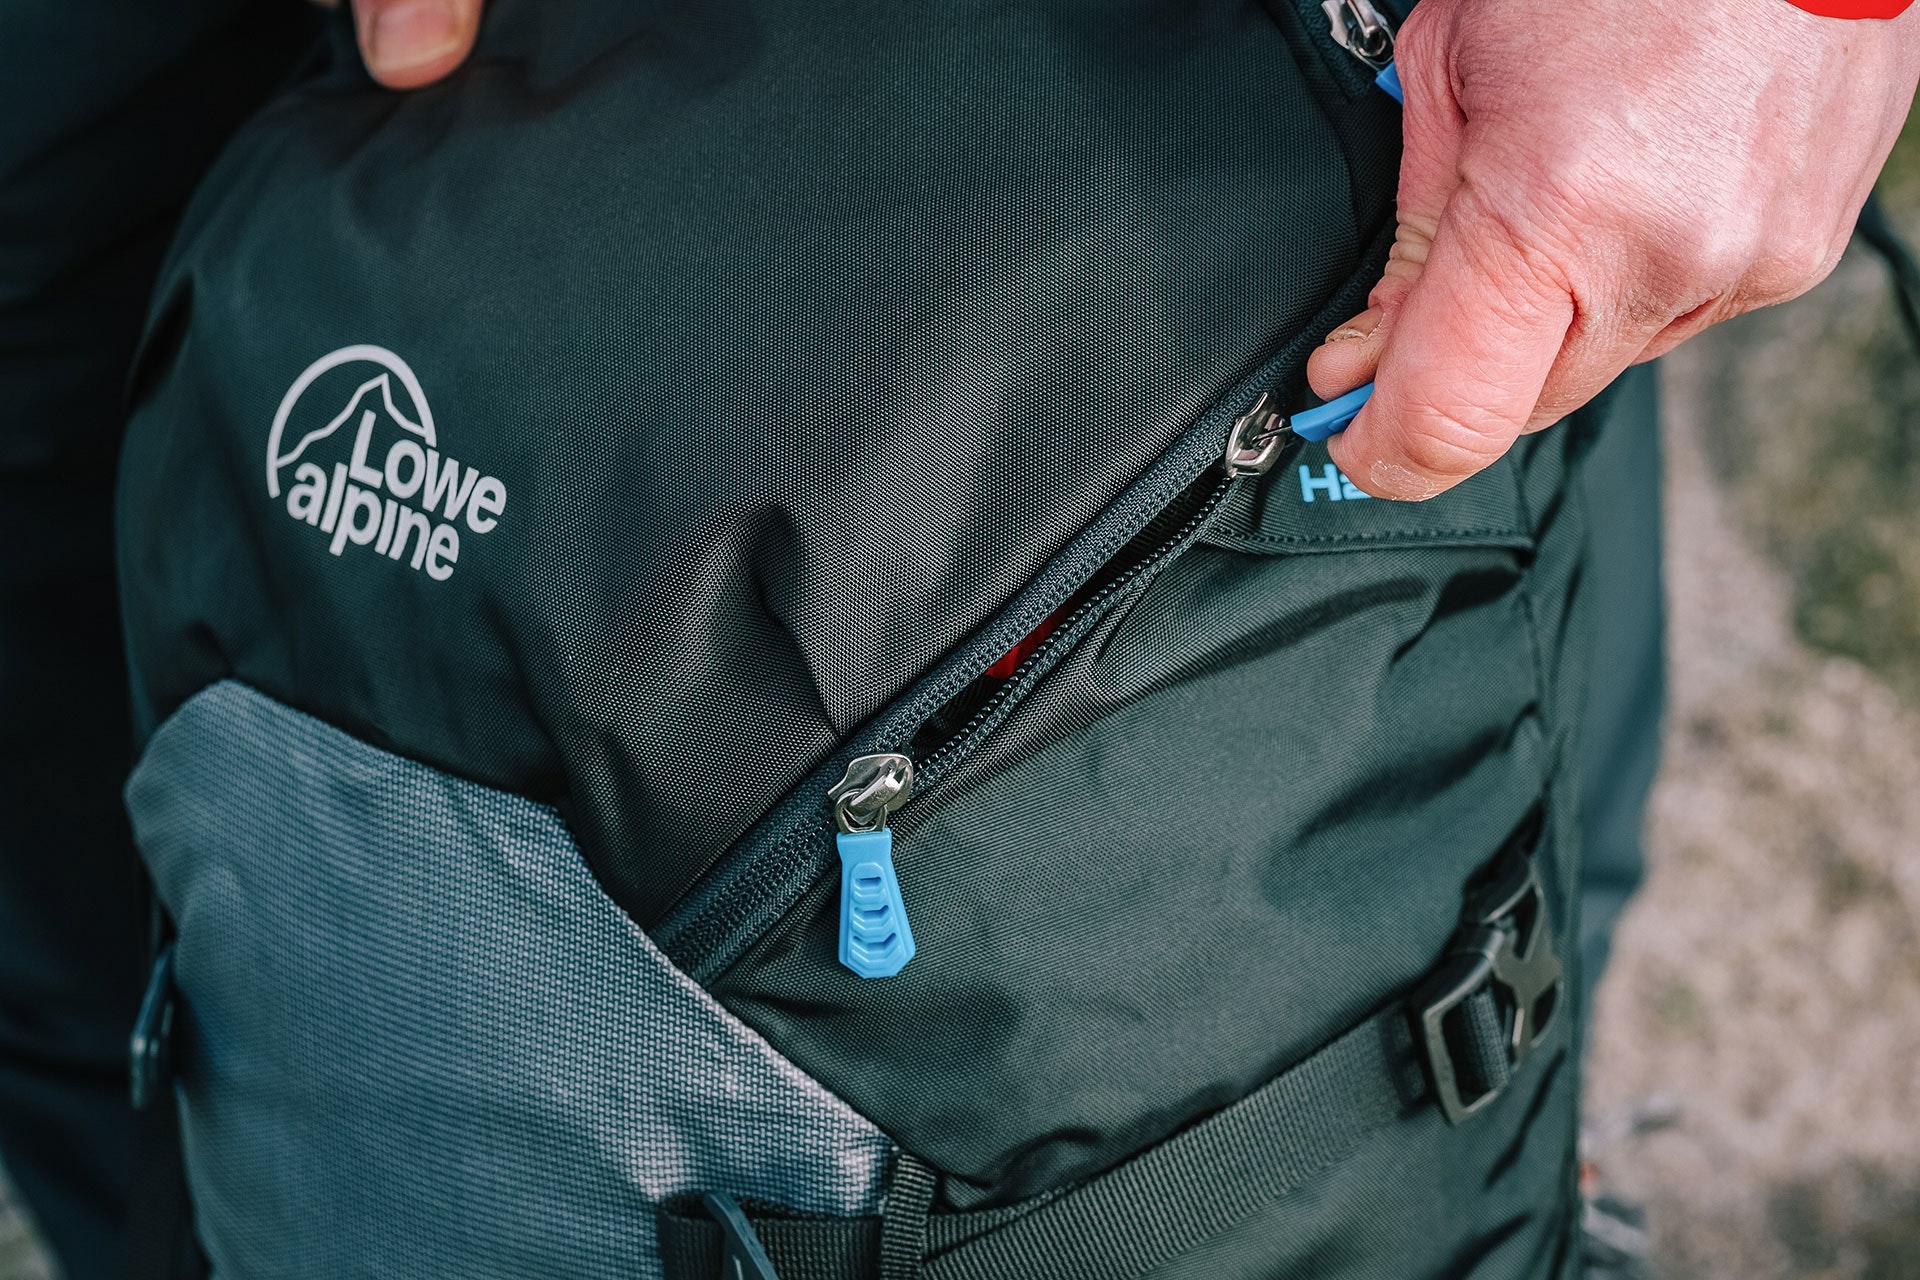 Onyx- Large Length Lowe Alpine Alpine Ascent 32 Litre Rucksack